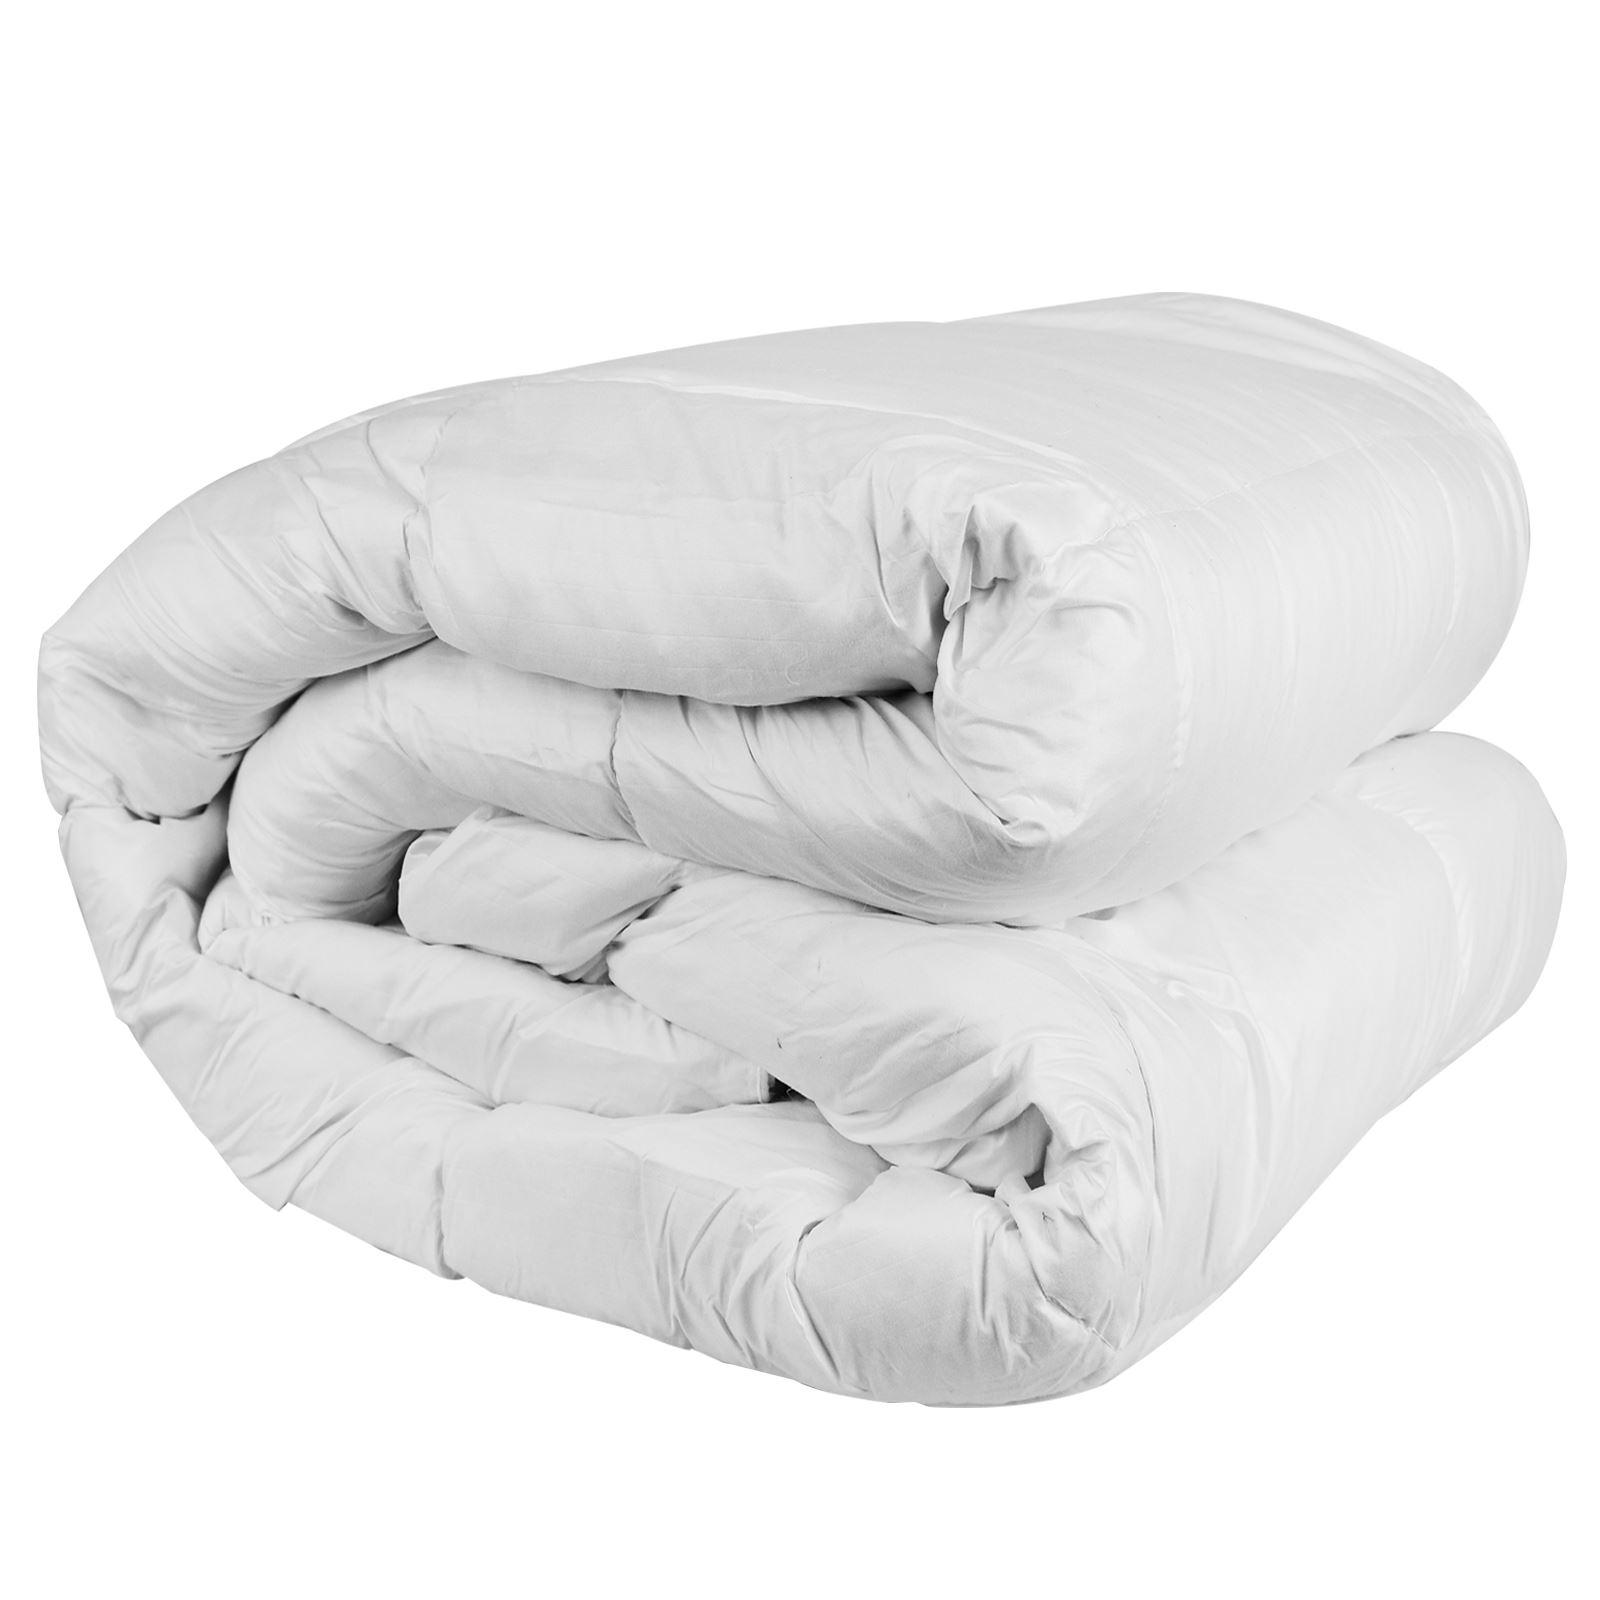 Lujo-Pluma-De-Pato-Abajo-Edredon-Ropa-De-Cama-Edredon-relleno-confortable-13-5-15-Tog miniatura 14